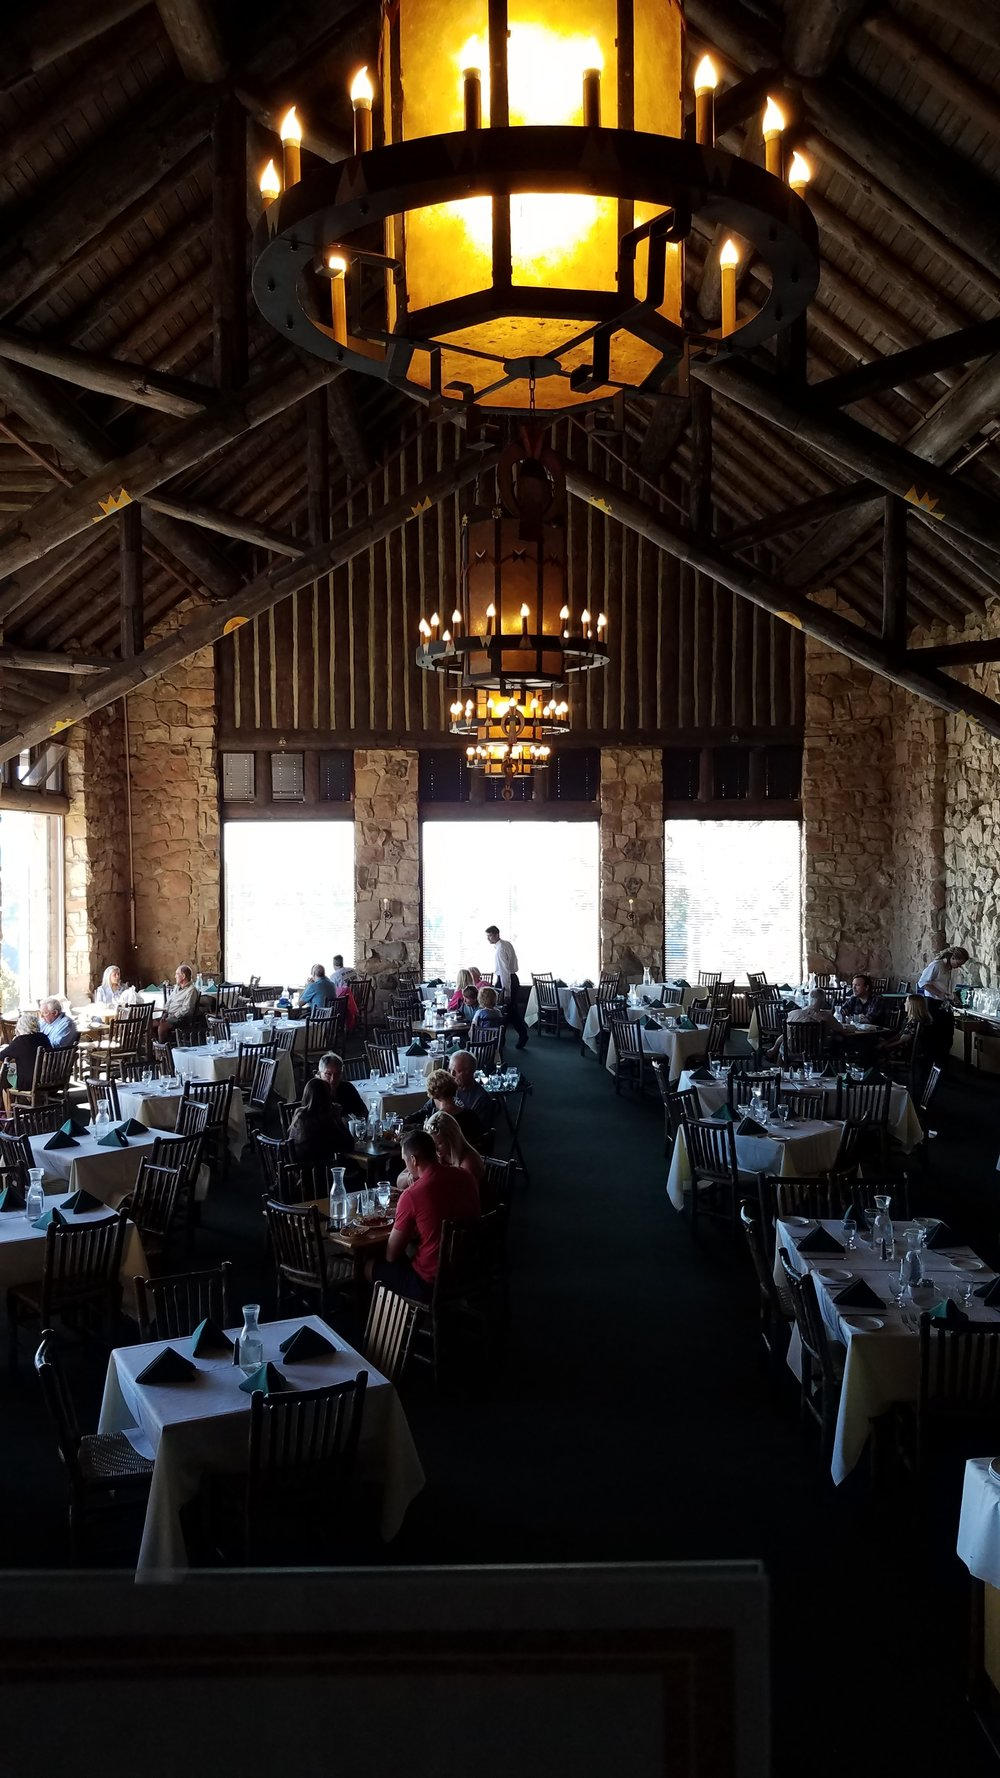 North Rim Lodge dining room, Grand Canyon National Park, AZ